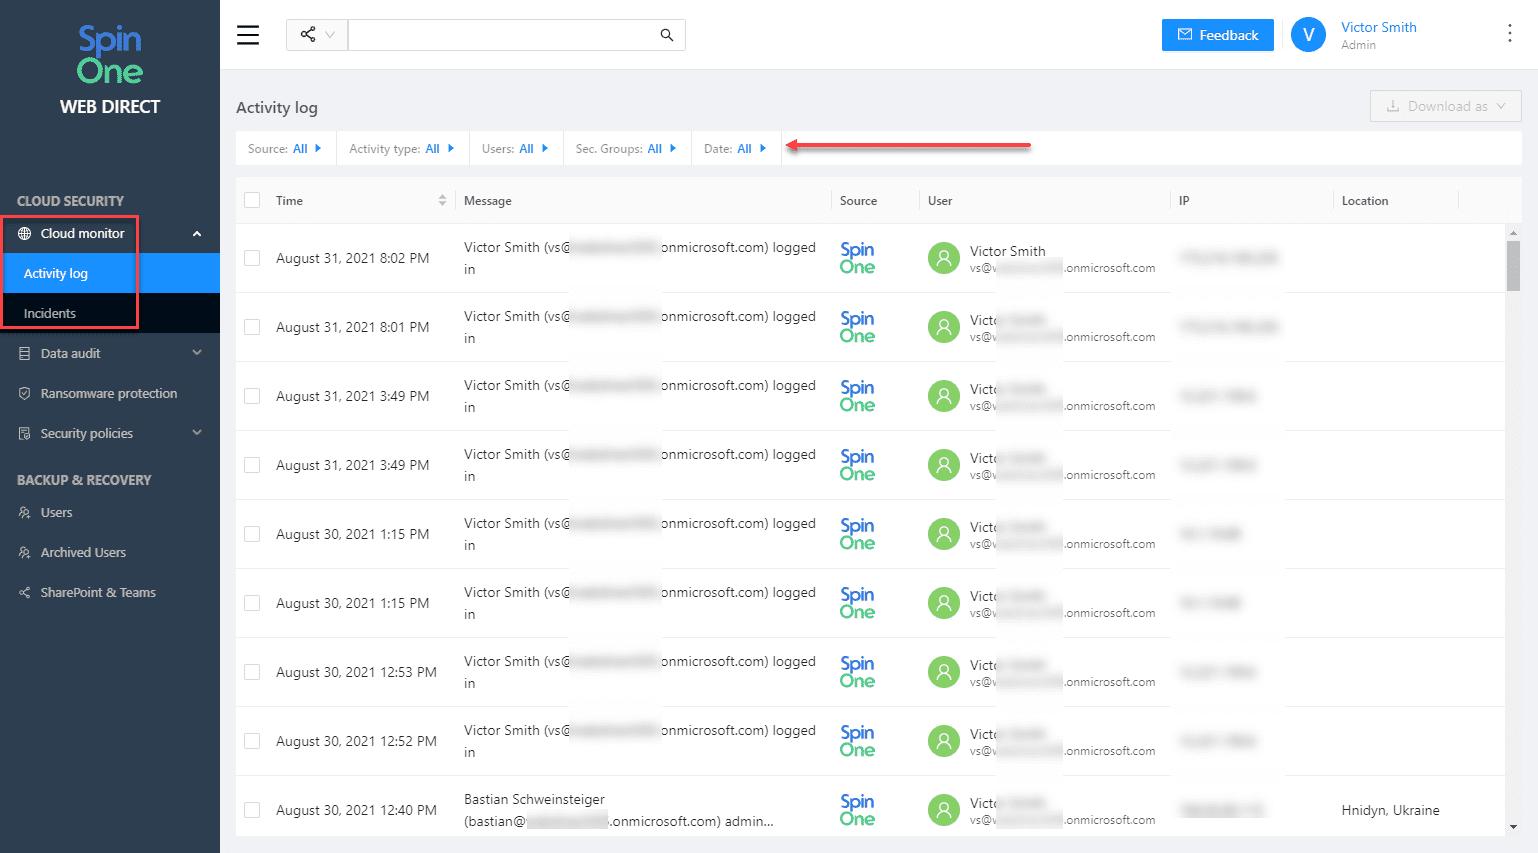 Viewing cloud monitor activity log using SpinOne